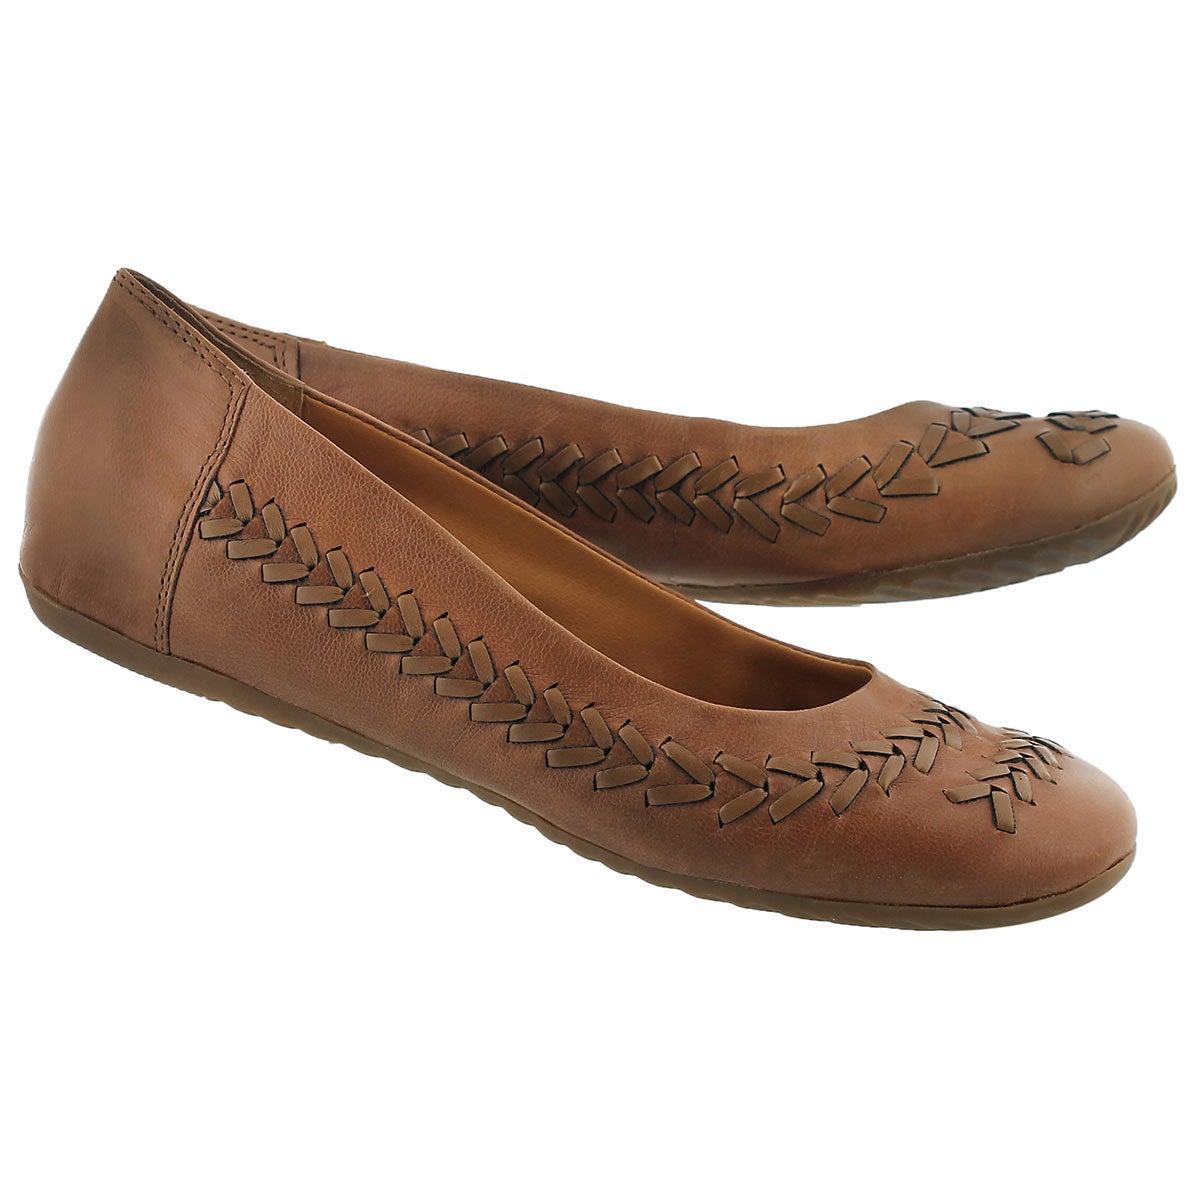 Lds Elsie tpe leather ballerina flat